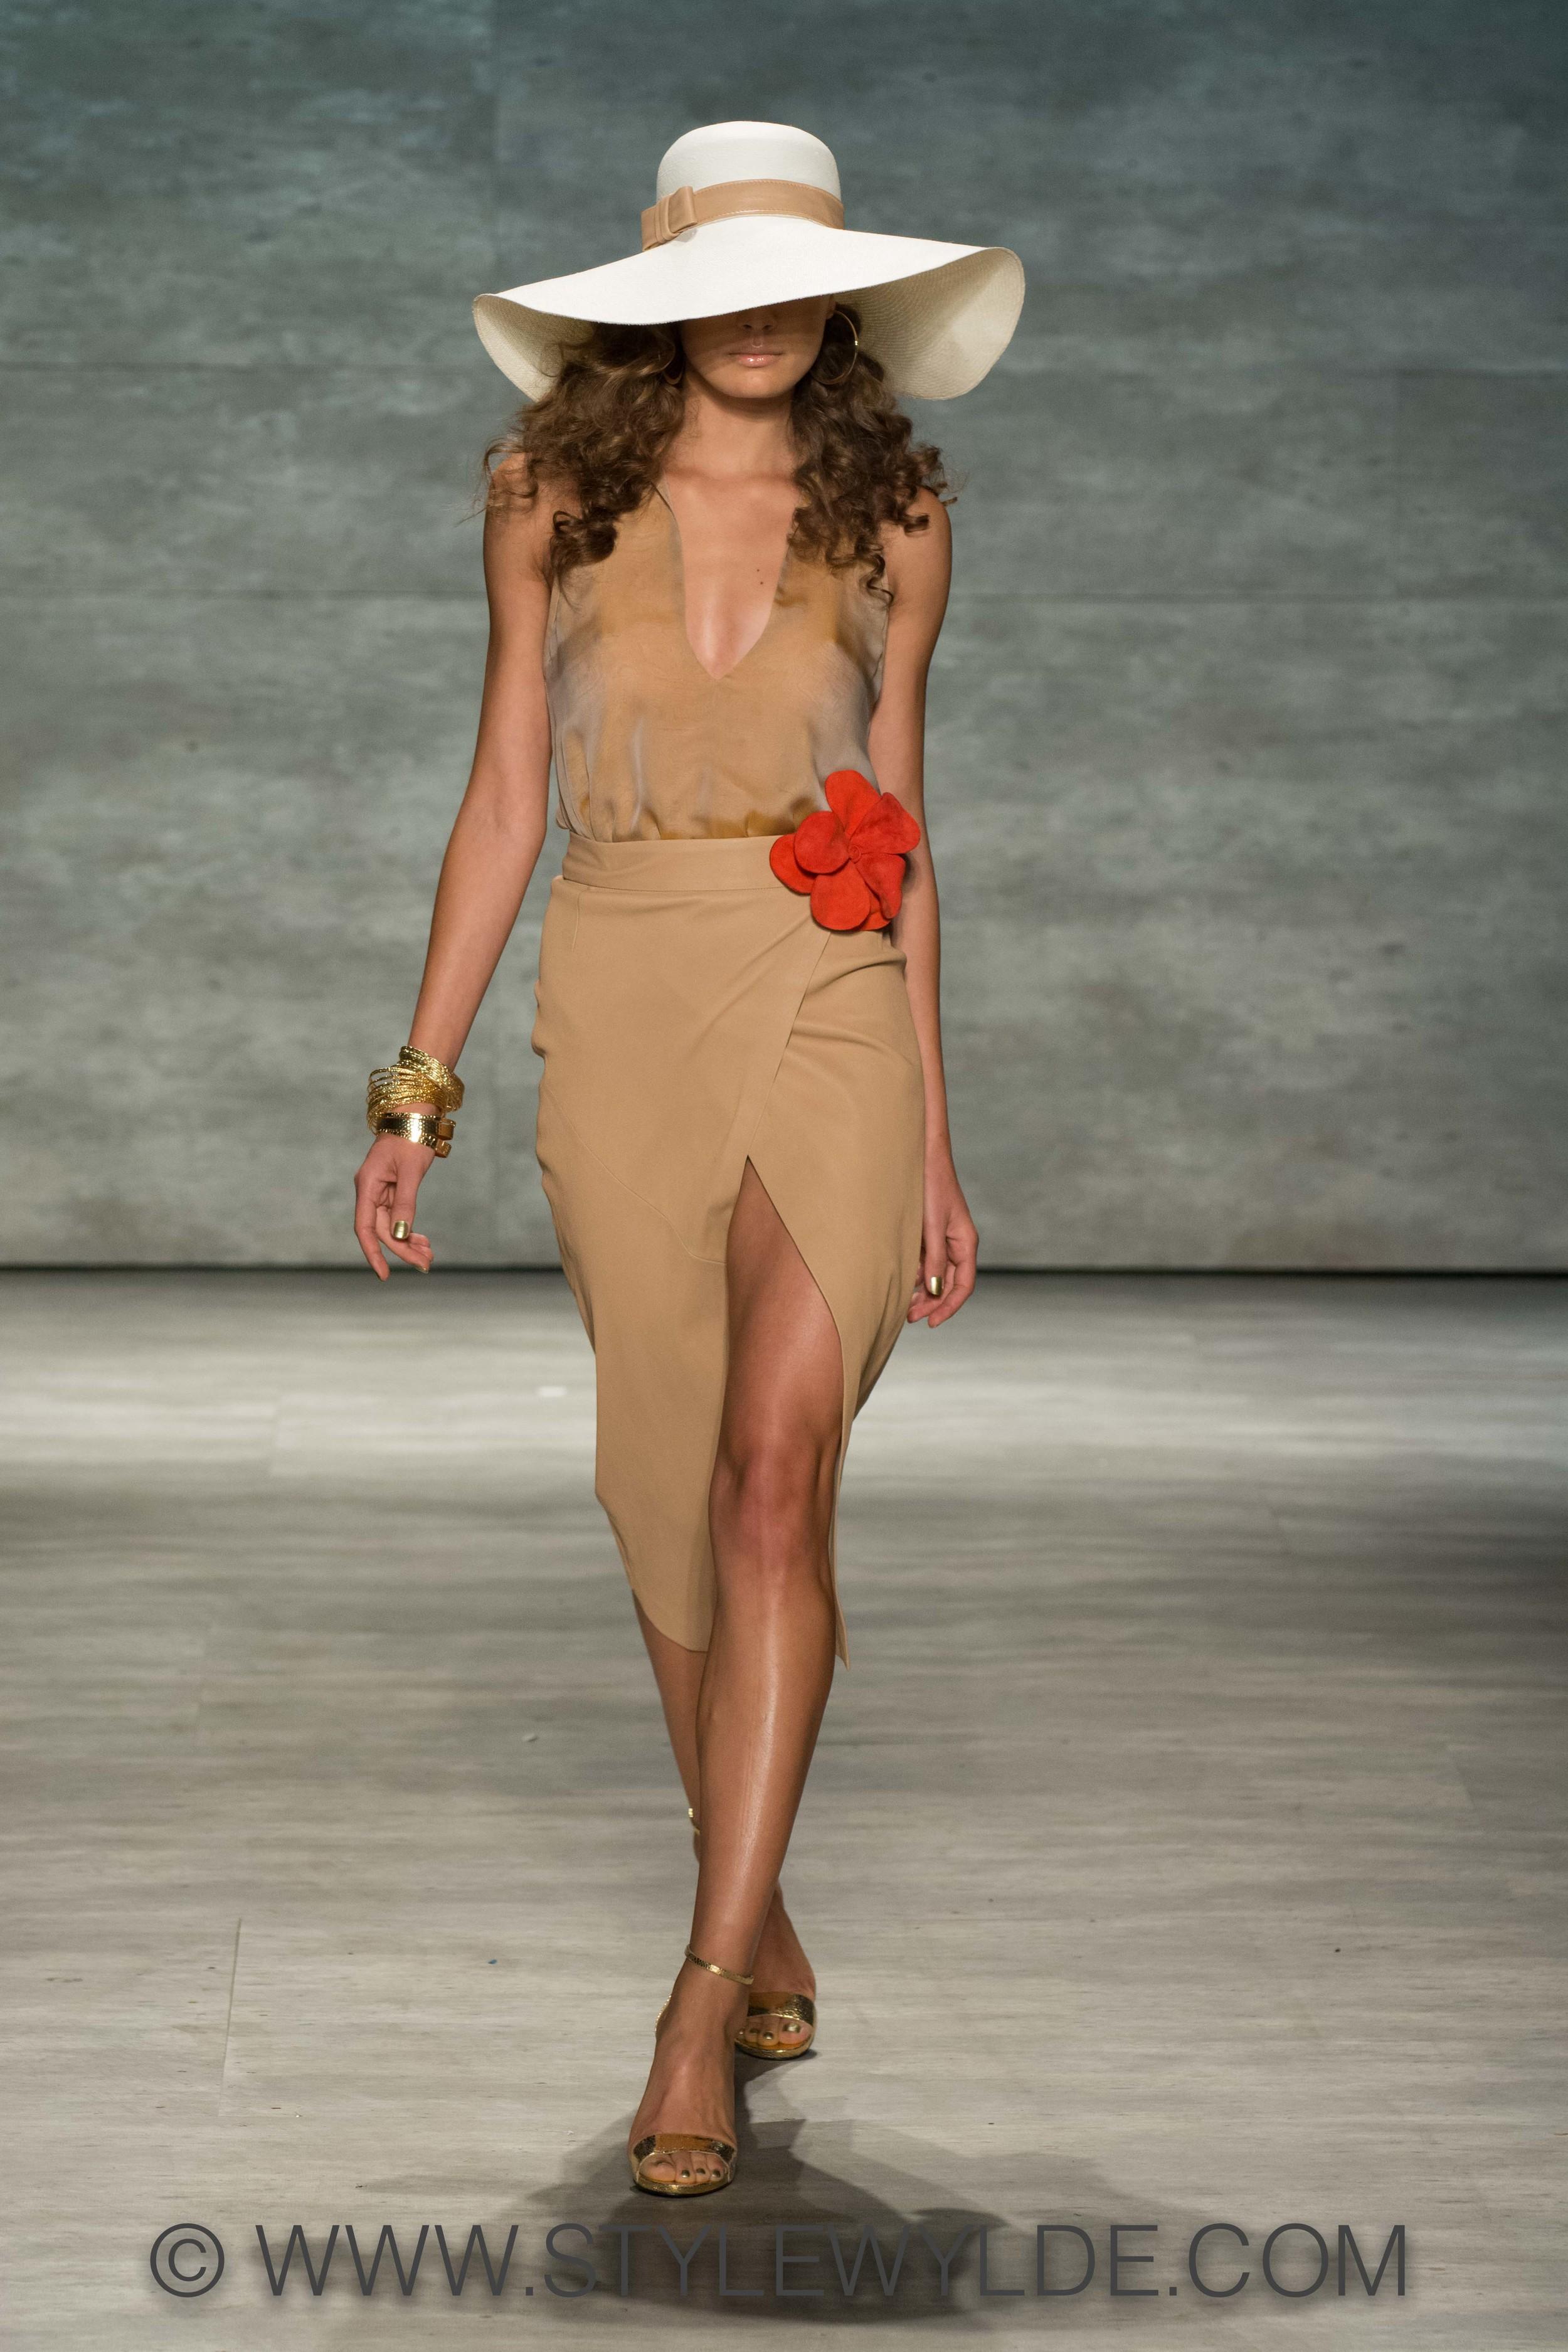 StyleWylde_Georgine_SS15_FOH (10 of 35).jpg